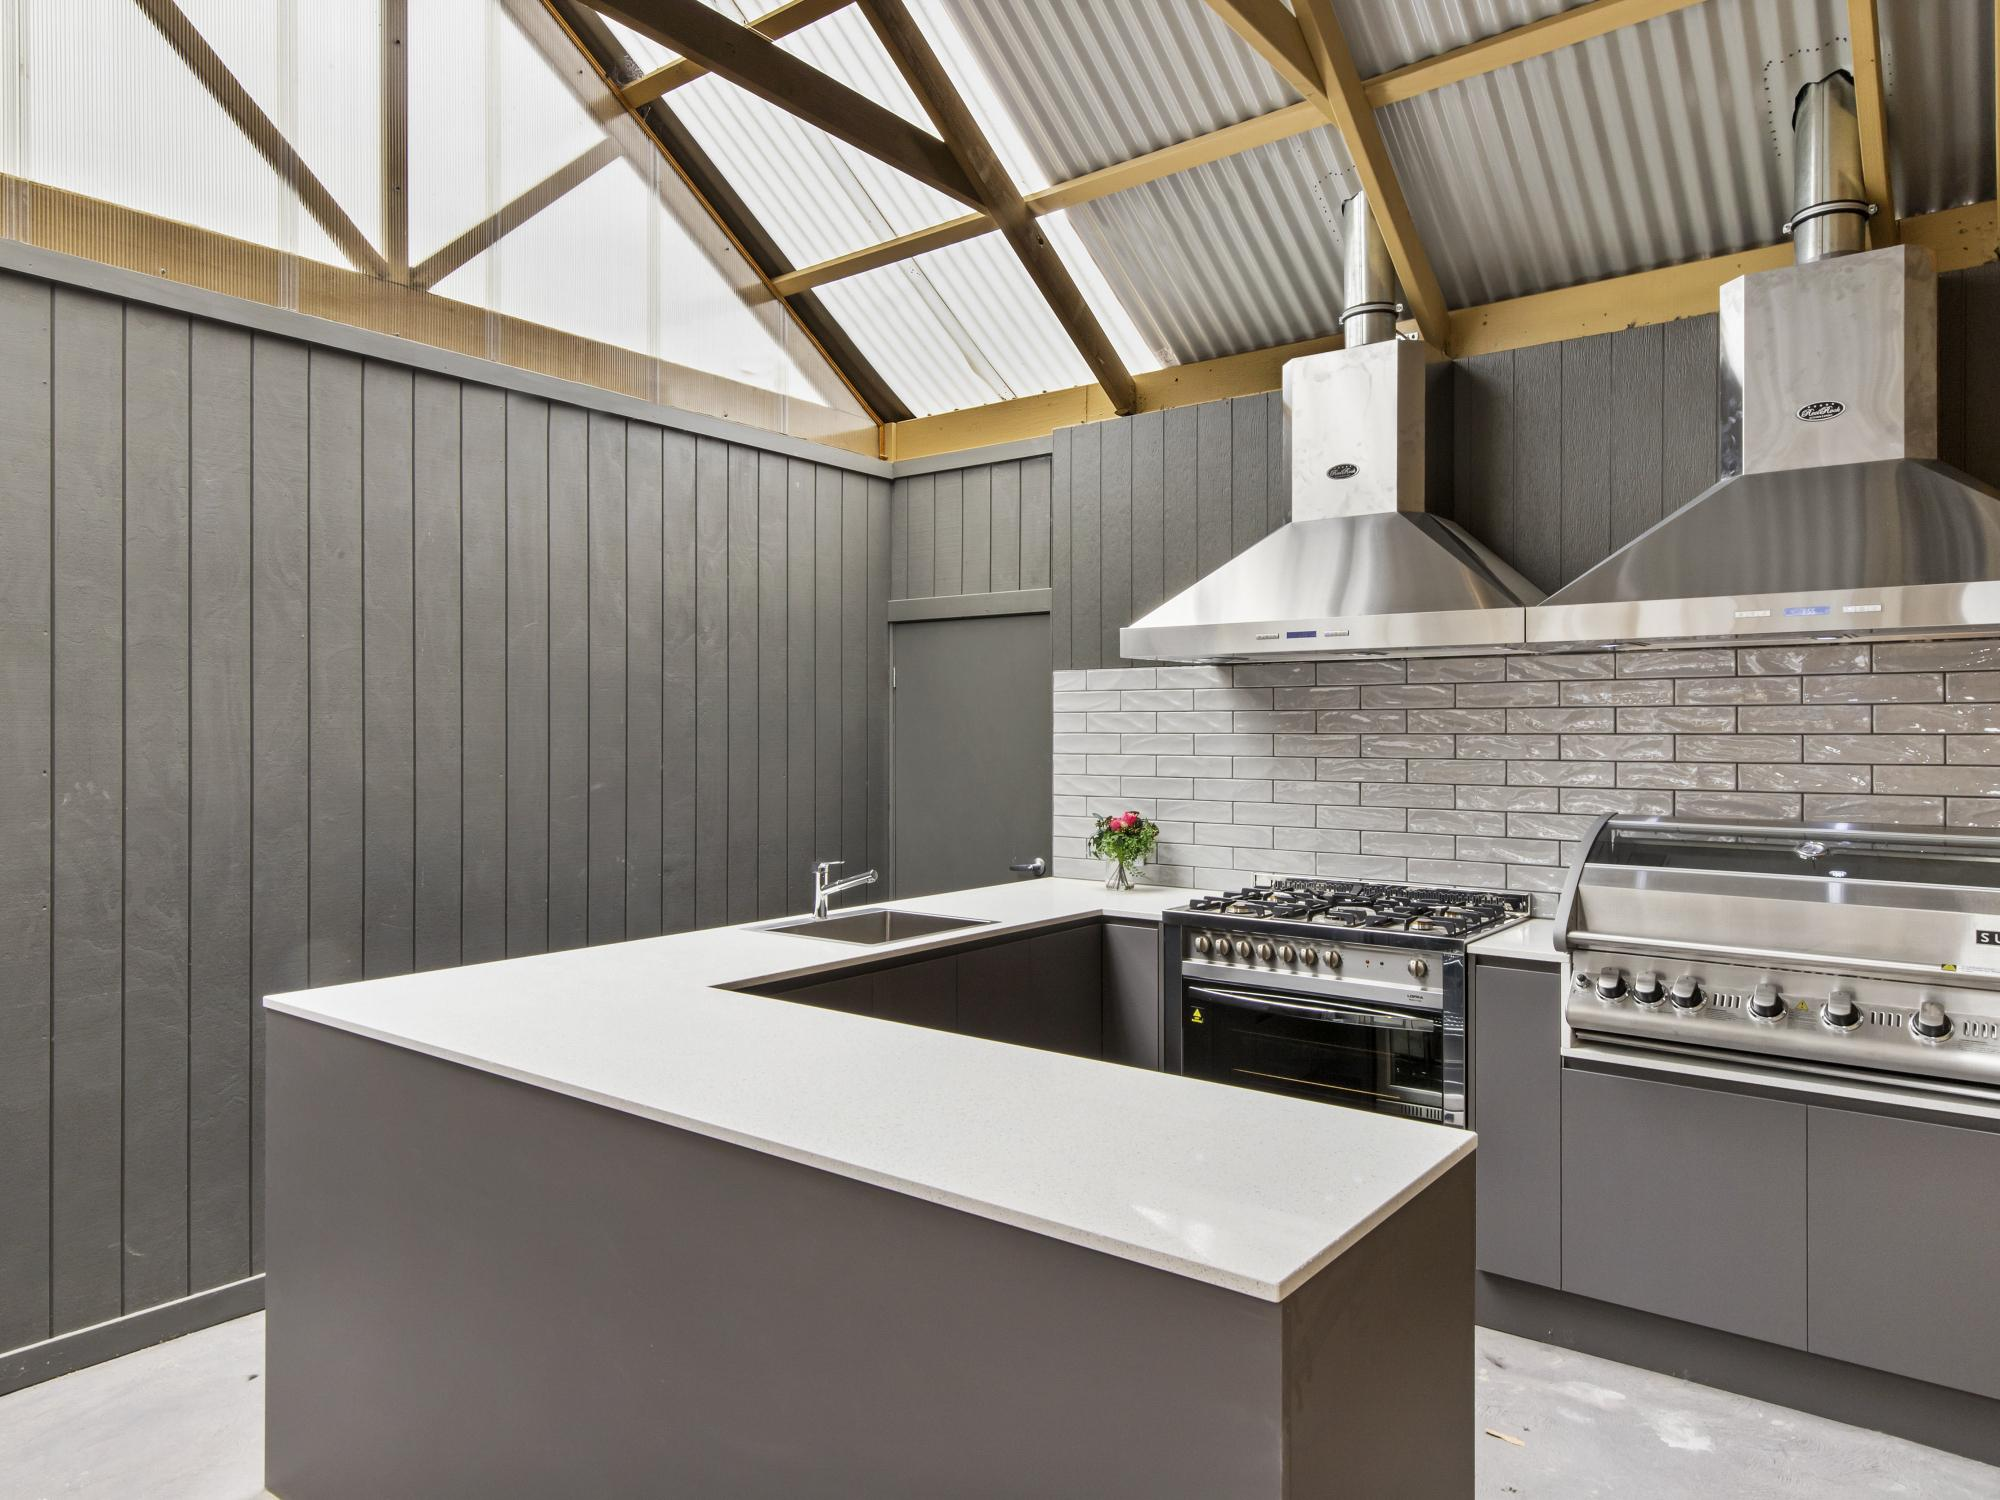 Kitchen Appliances Renovations Services - Bayview Renovations